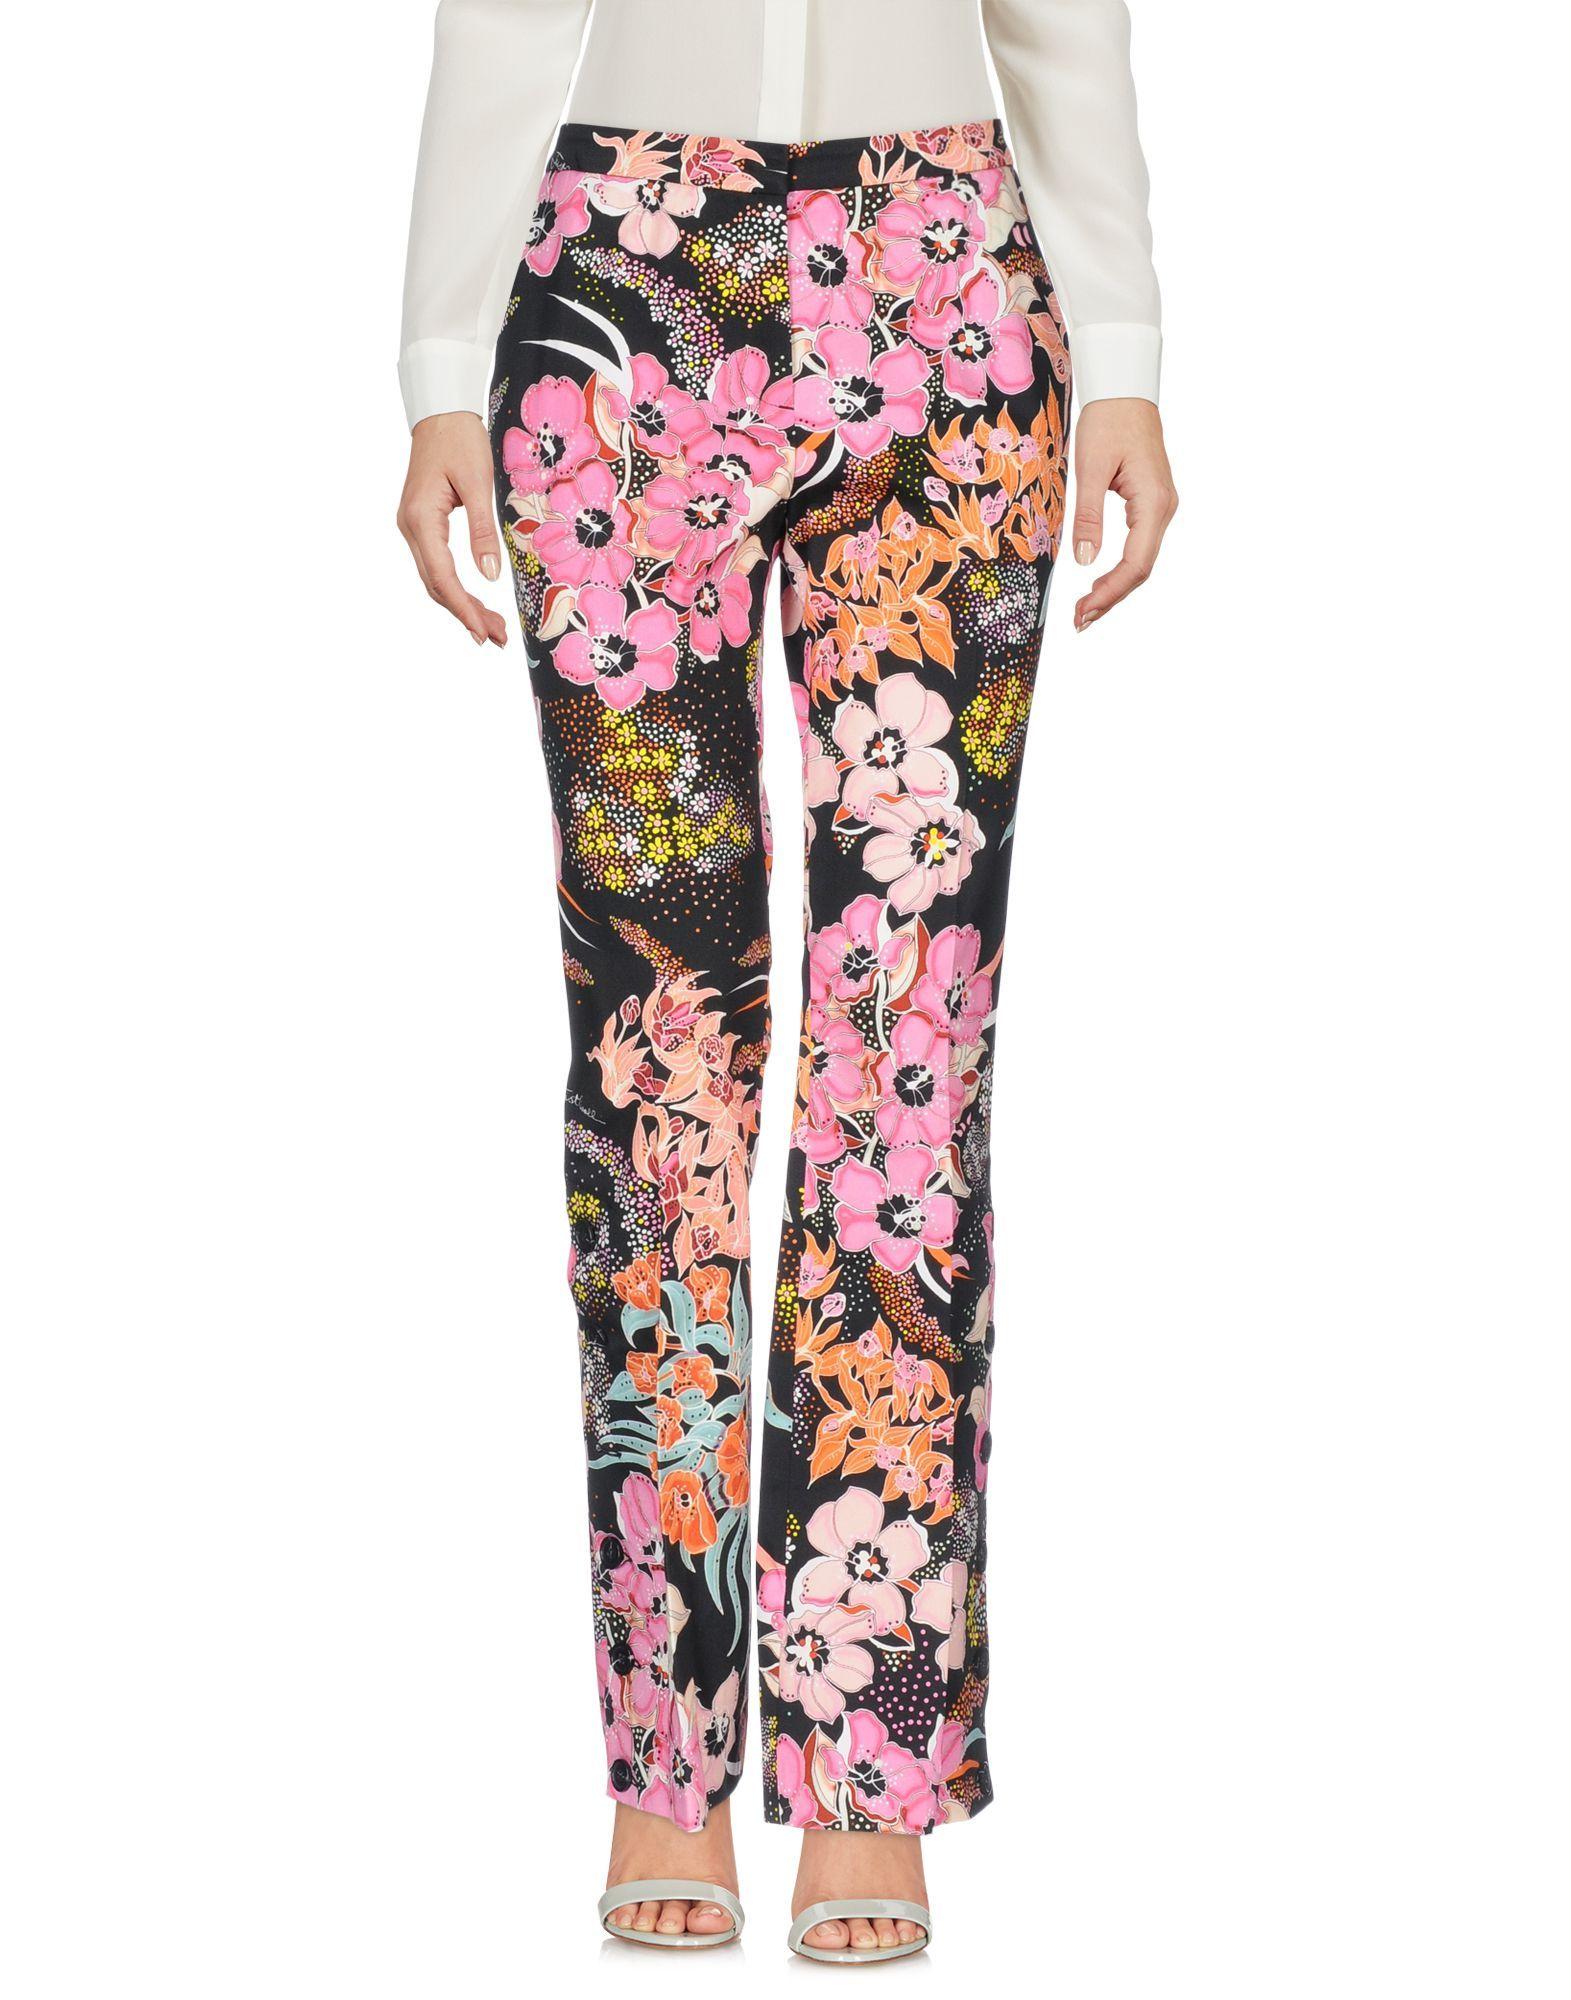 Just Cavalli Black Print Cotton Trousers